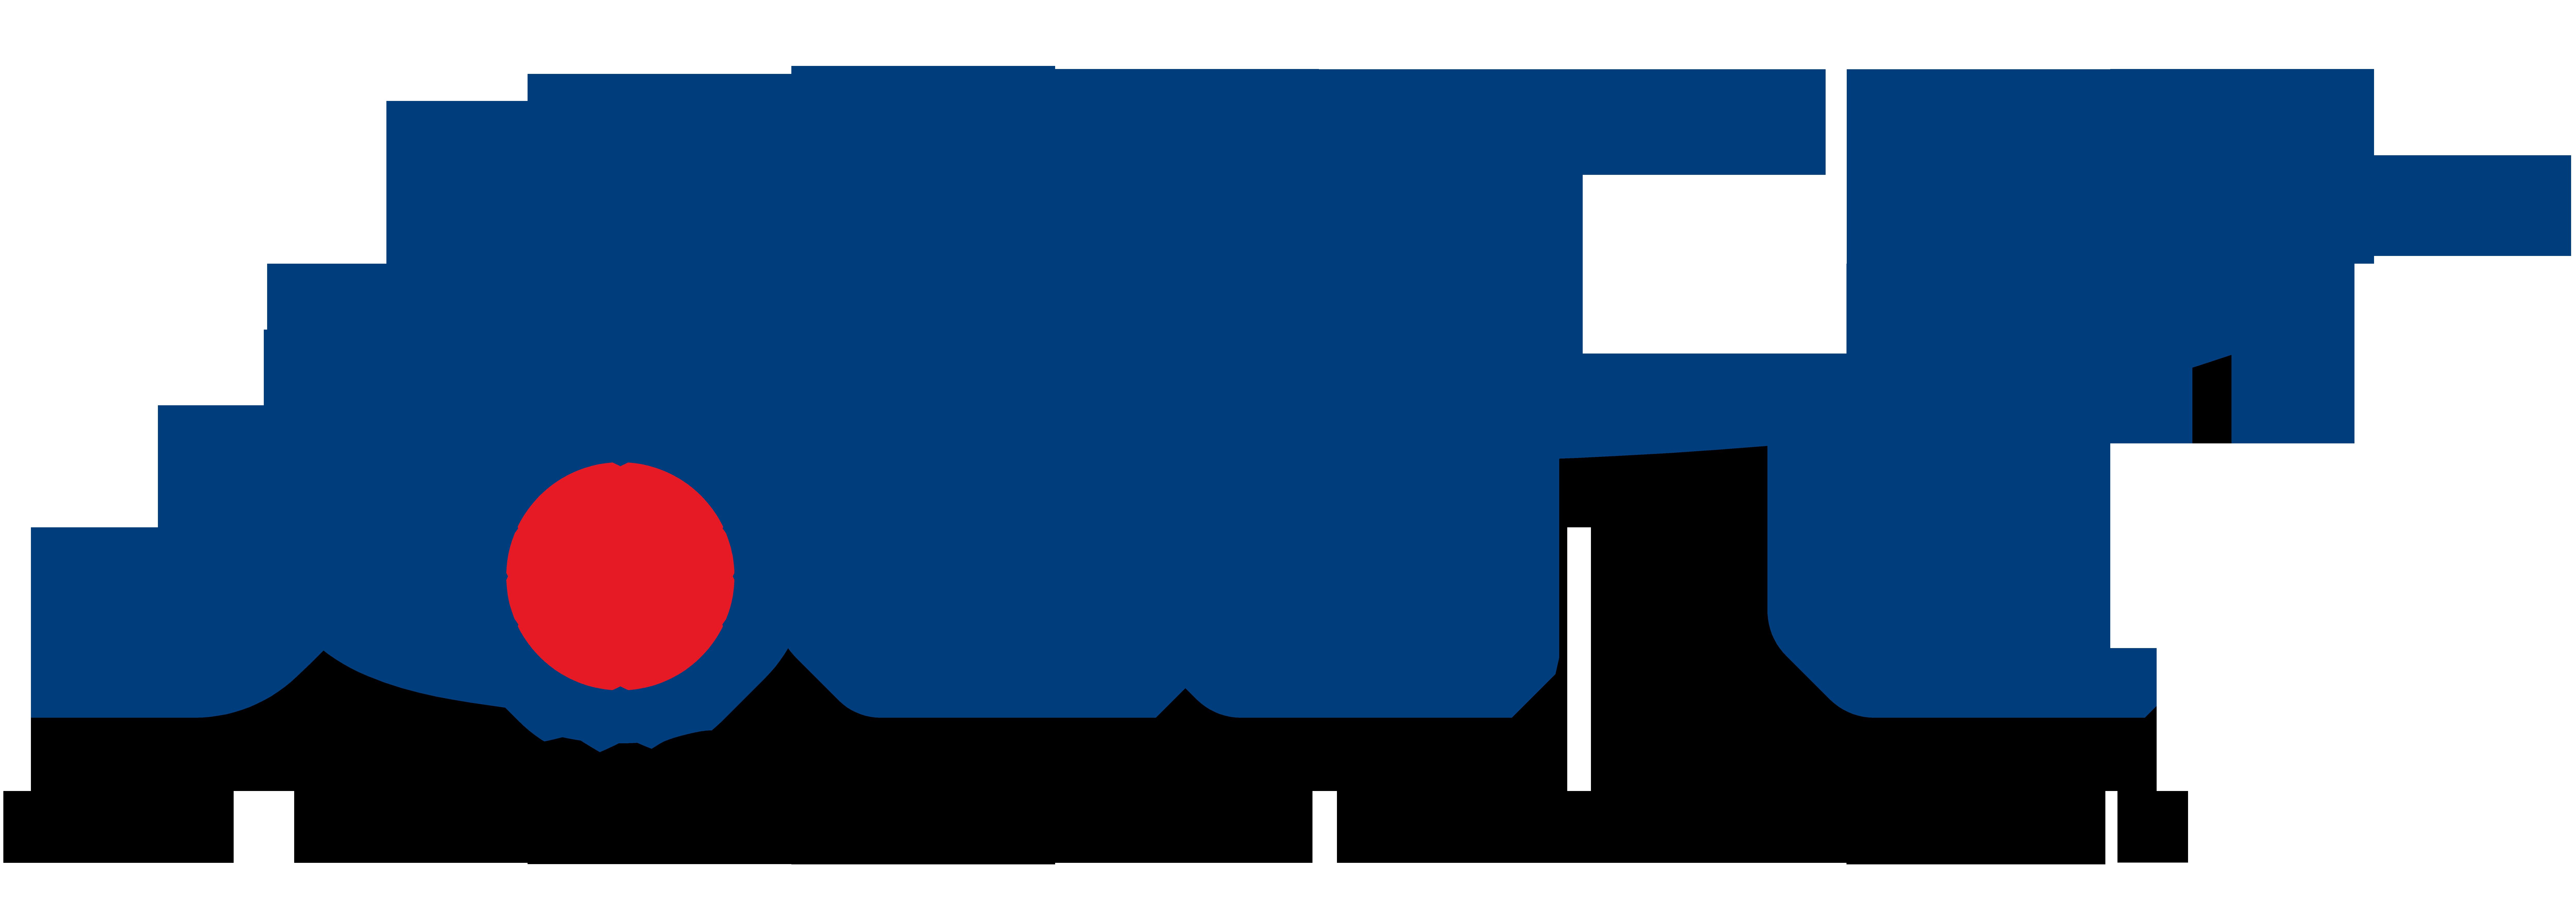 Air net llc clipart clipart free download Air Transport International - Wikipedia clipart free download